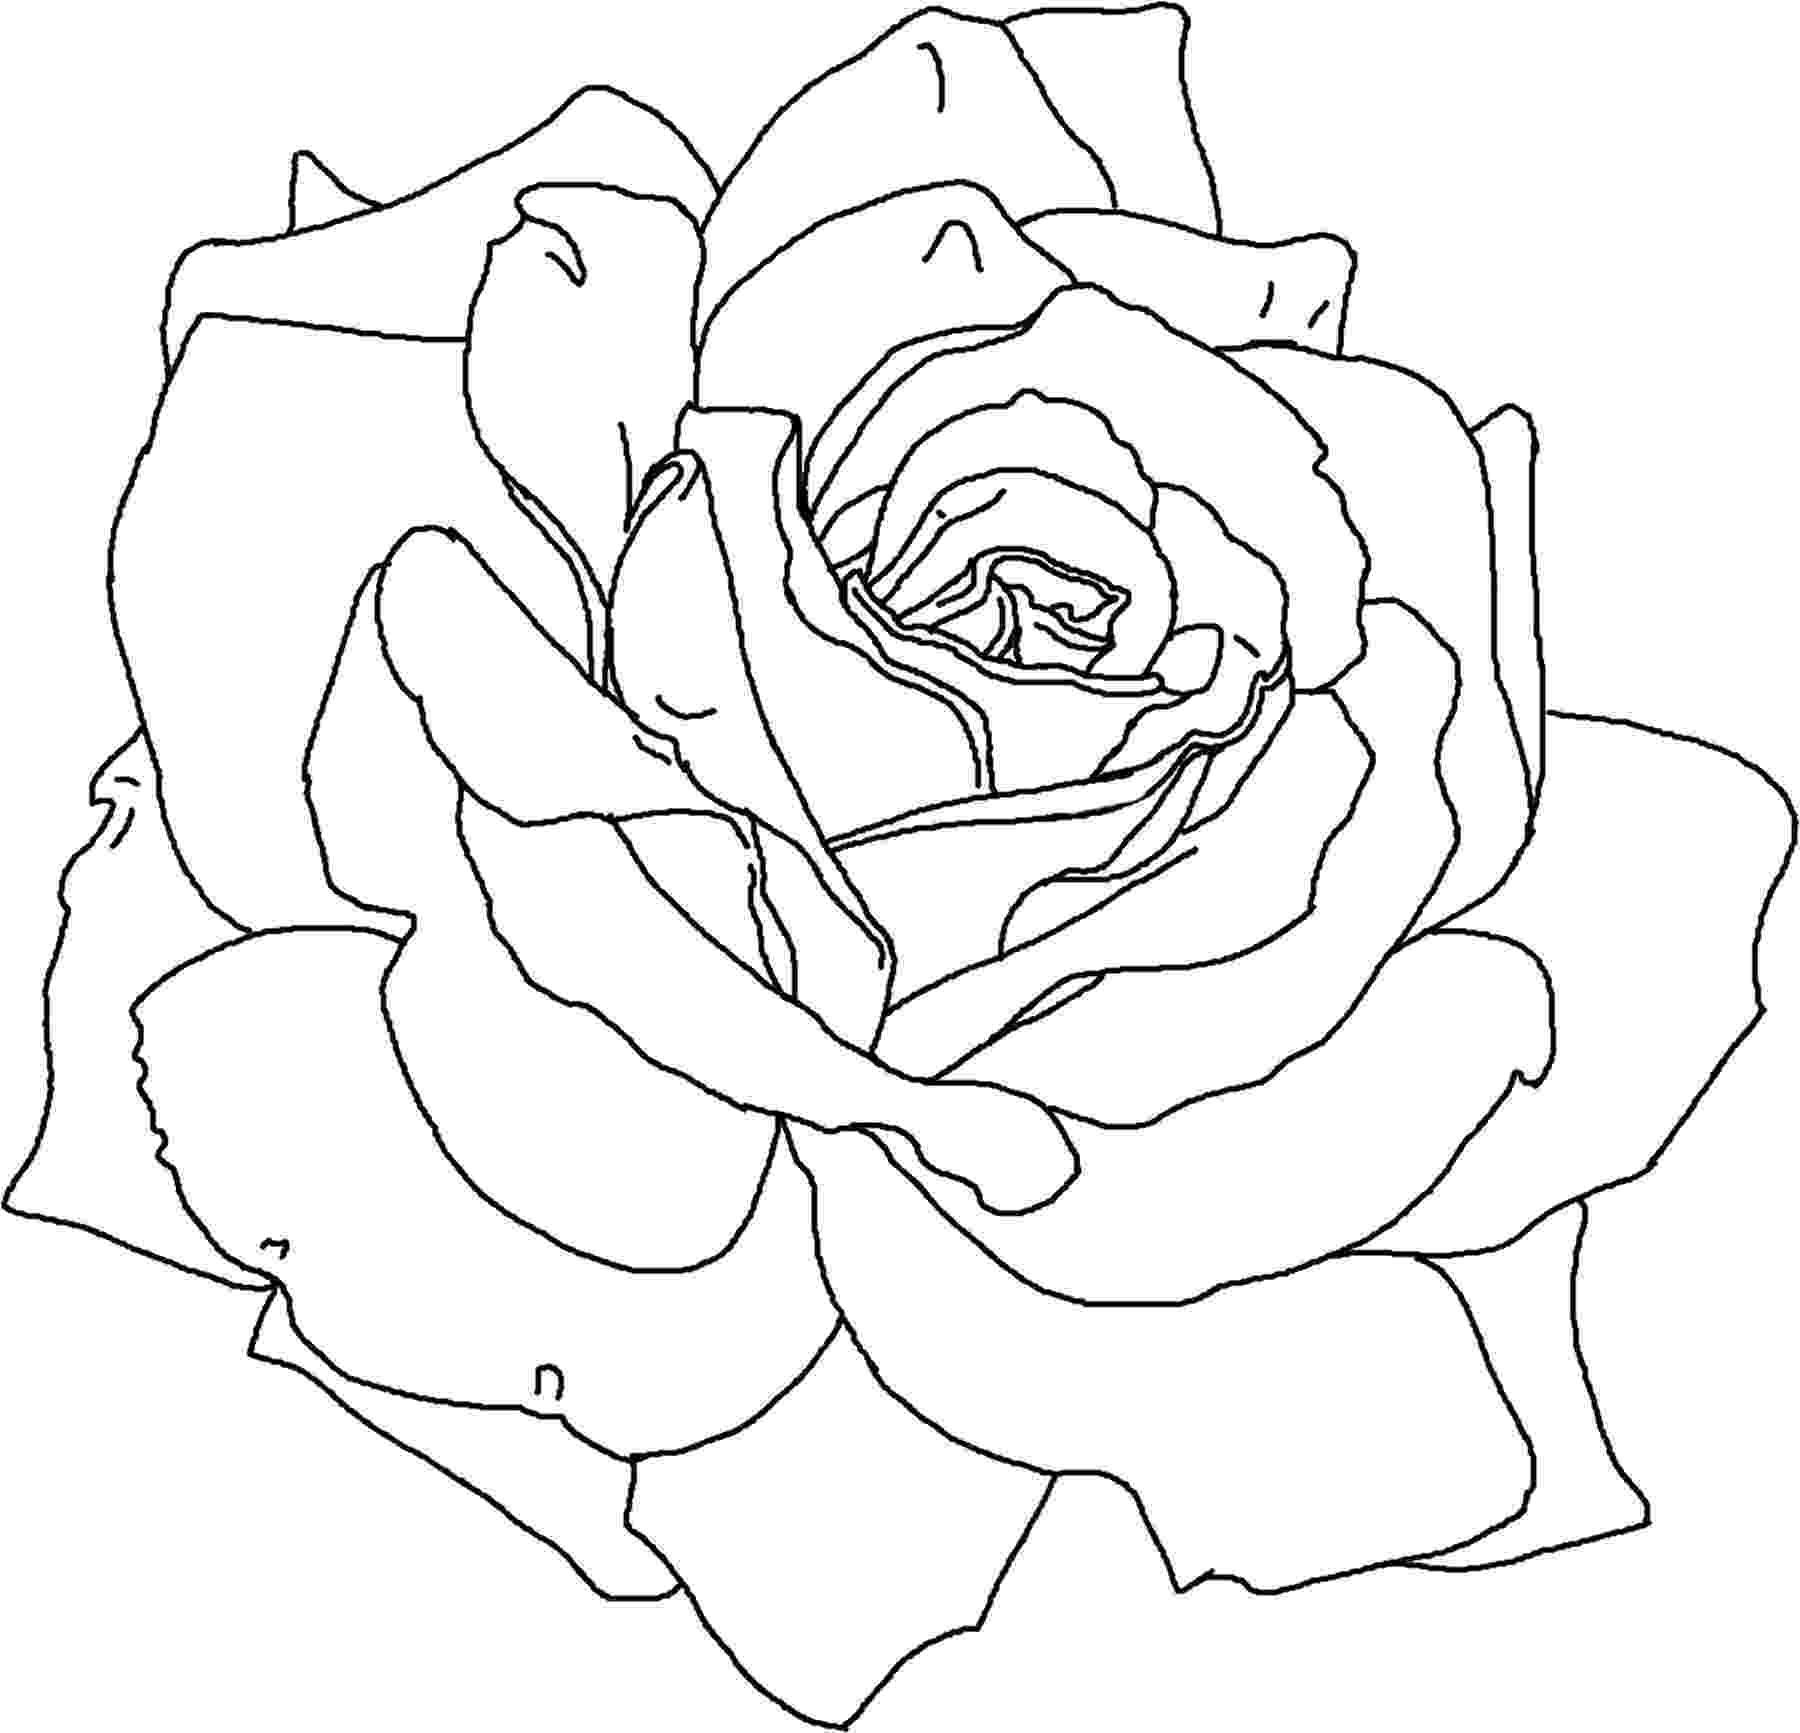 flower printouts flower coloring printables for kids flower printouts